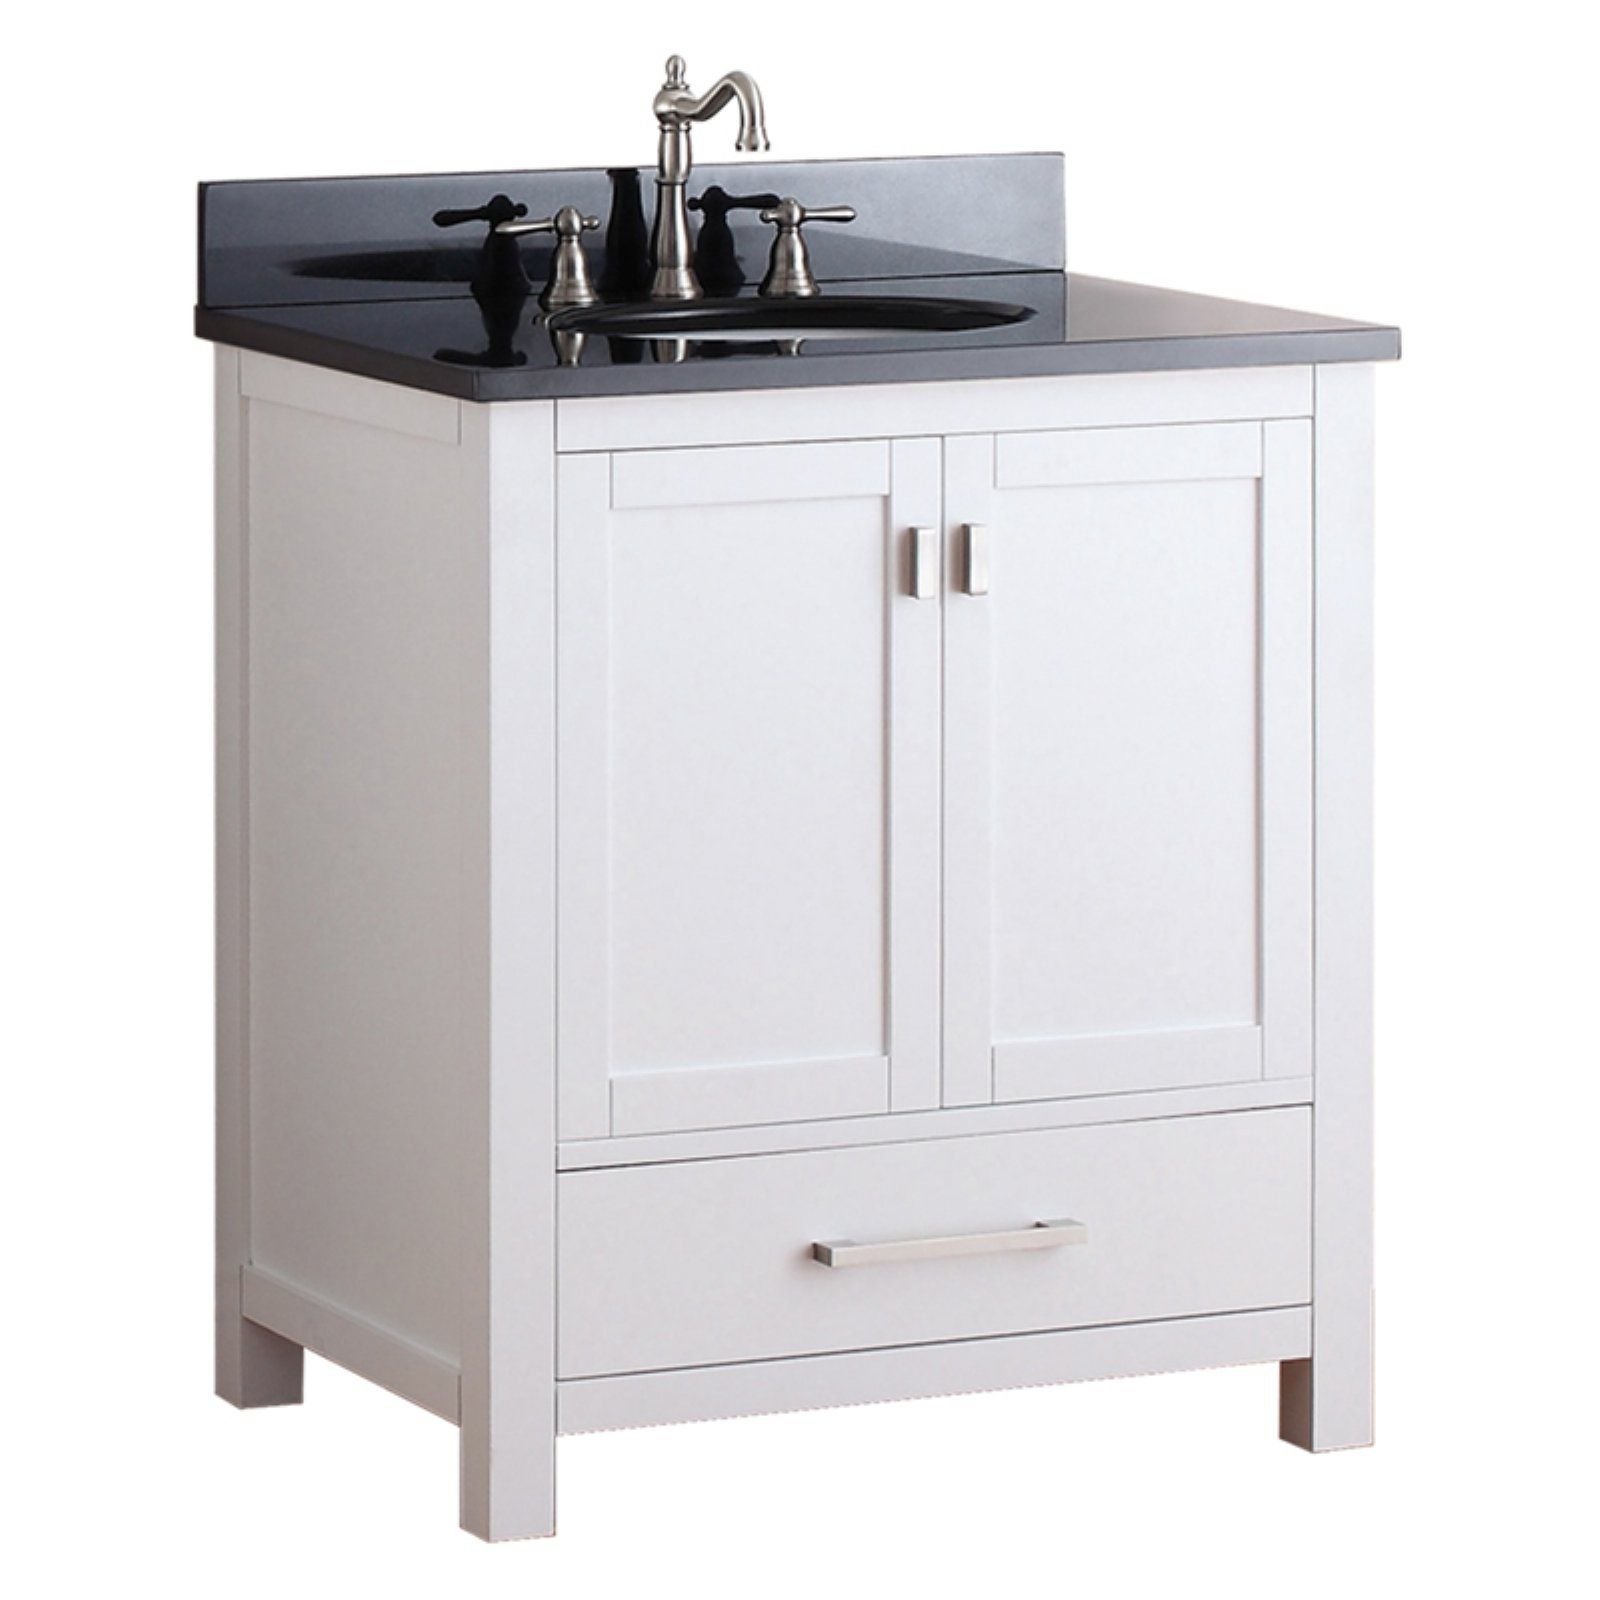 Avanity Modero Vs30 Wt Modero 30 In Single Bathroom Vanity Without Top Bathroom Vanities Without Tops Single Bathroom Vanity Bathroom Vanity Combo